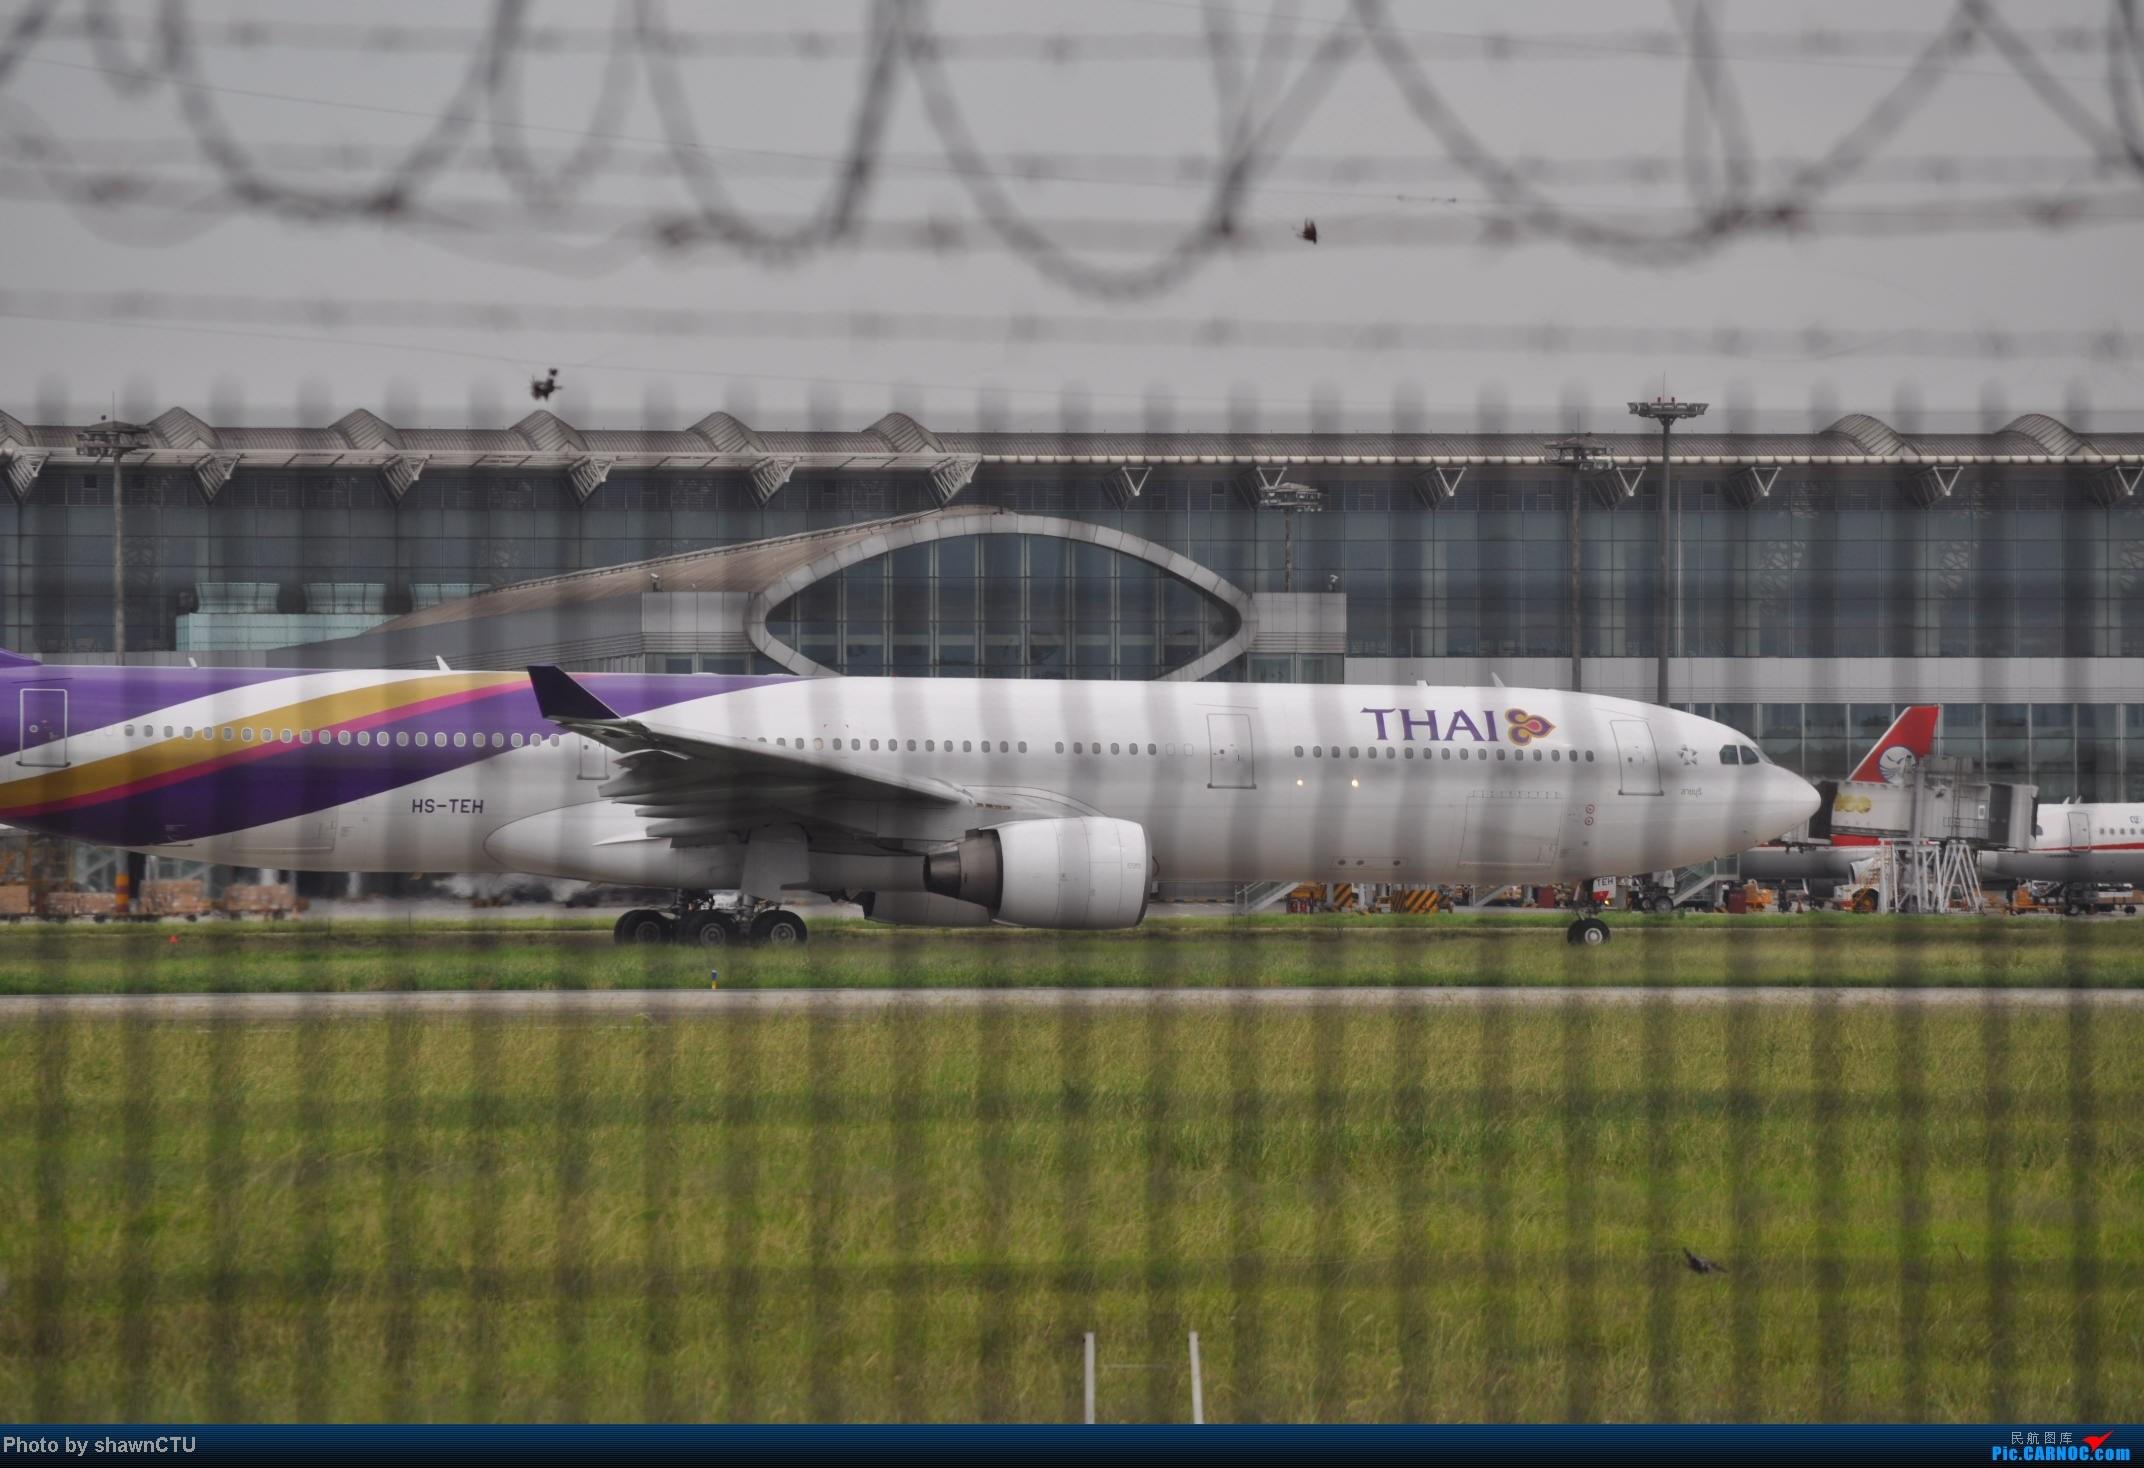 Re:[原创]2012年8月21日TG A333 HS-TEN AIRBUS A330-300 HS-TEN CTU